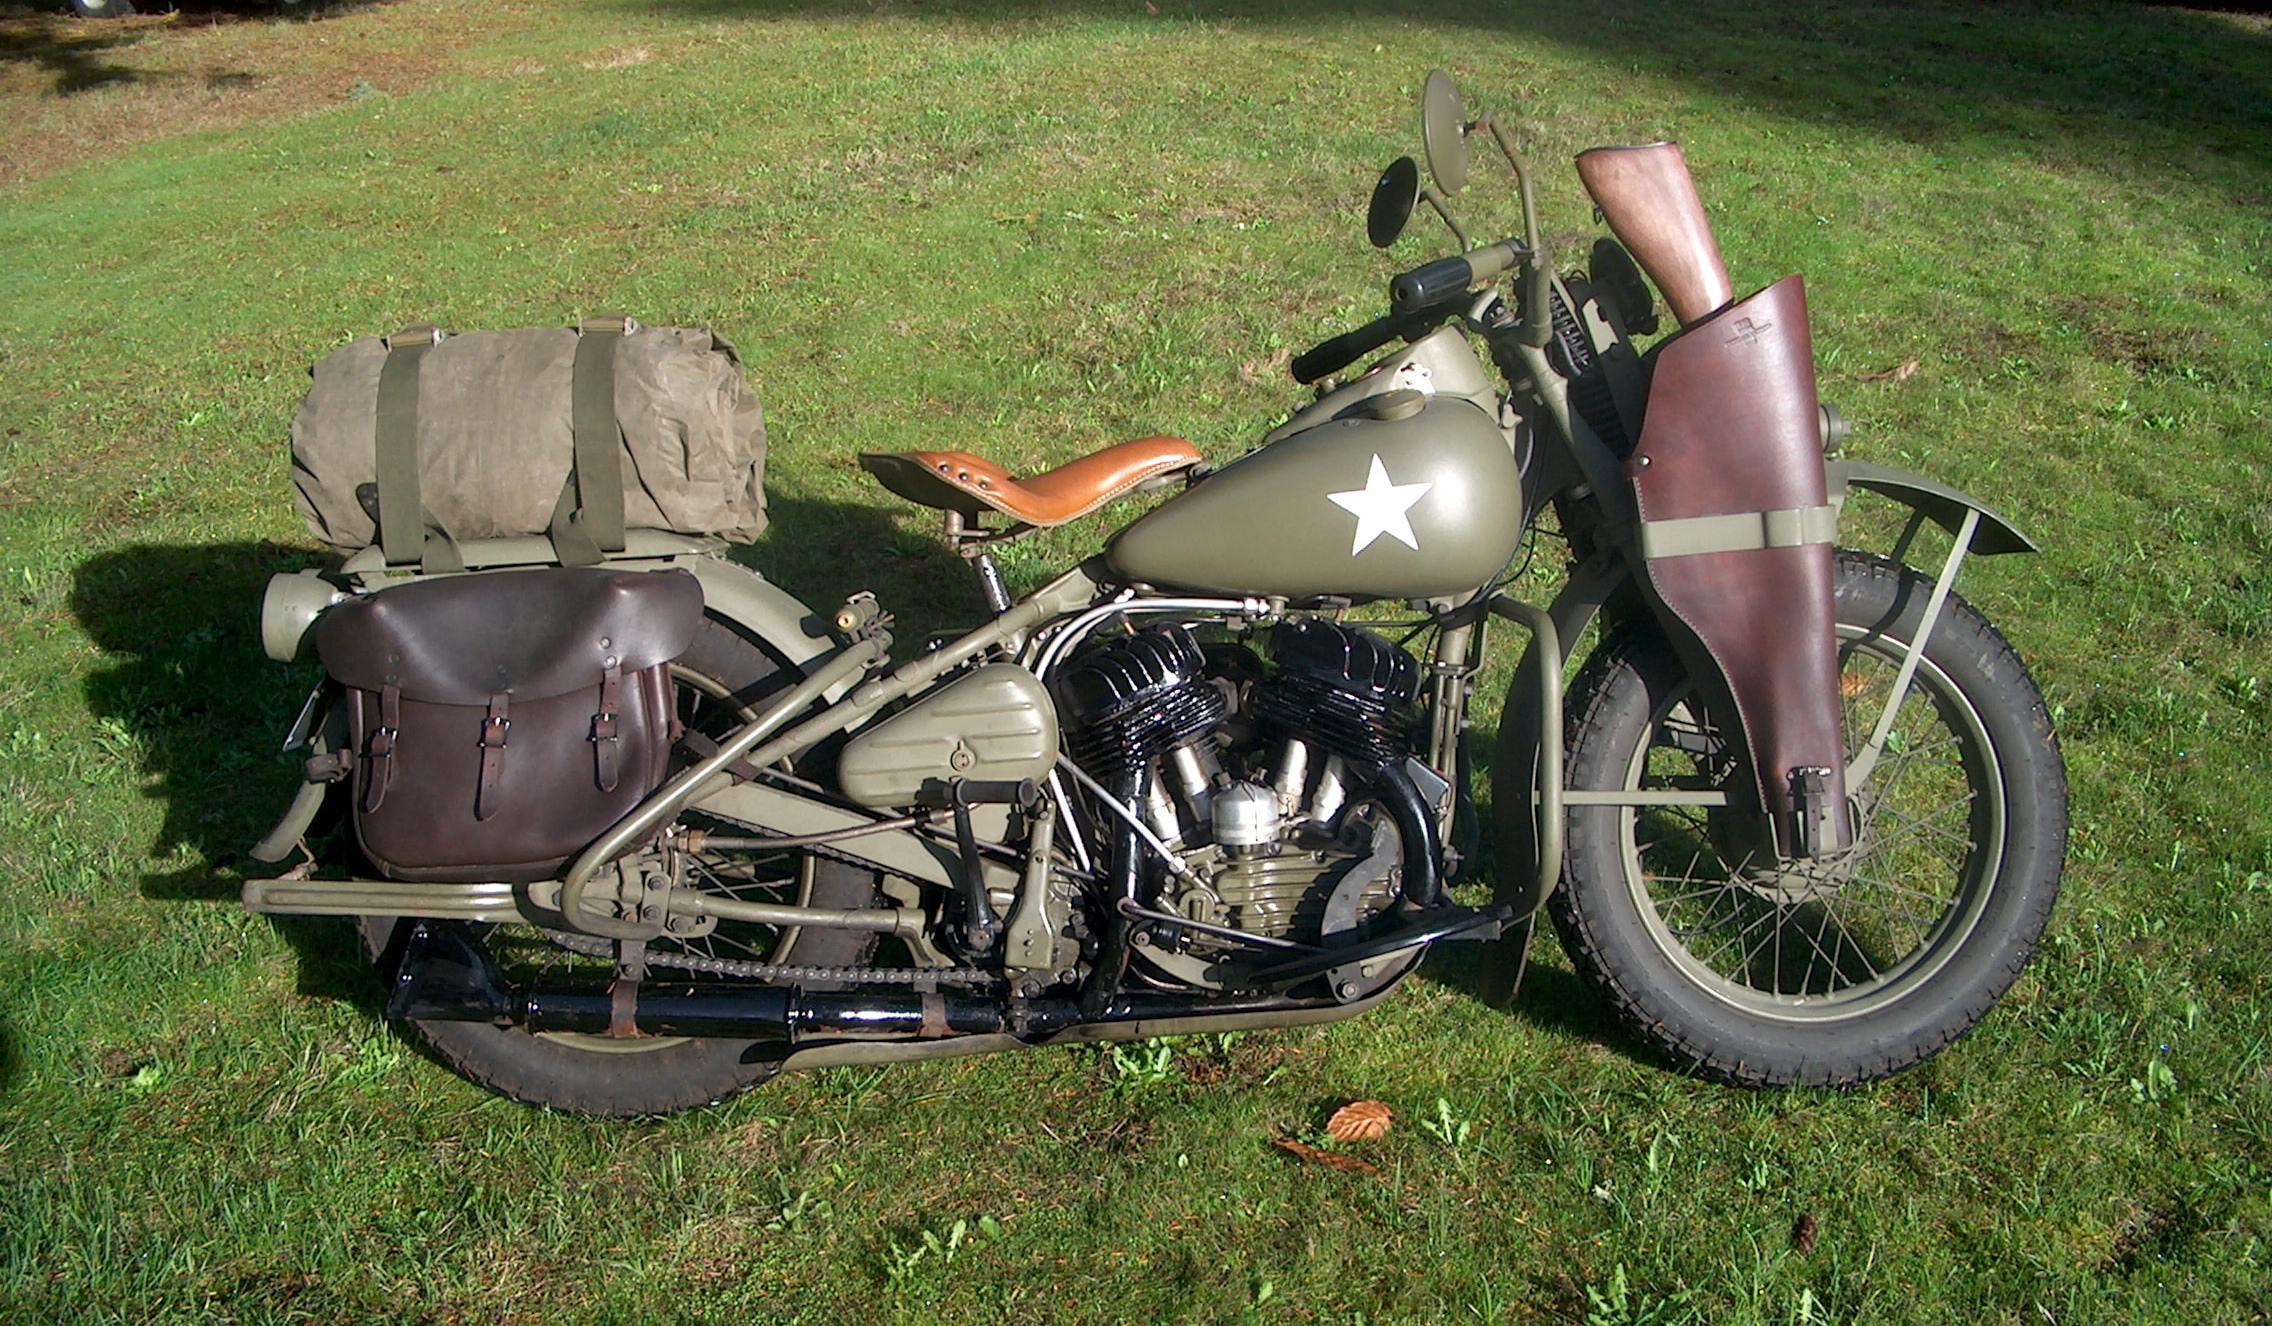 1942 Harley Davidson WLA Military Type VII retro wallpaper 2272x1326